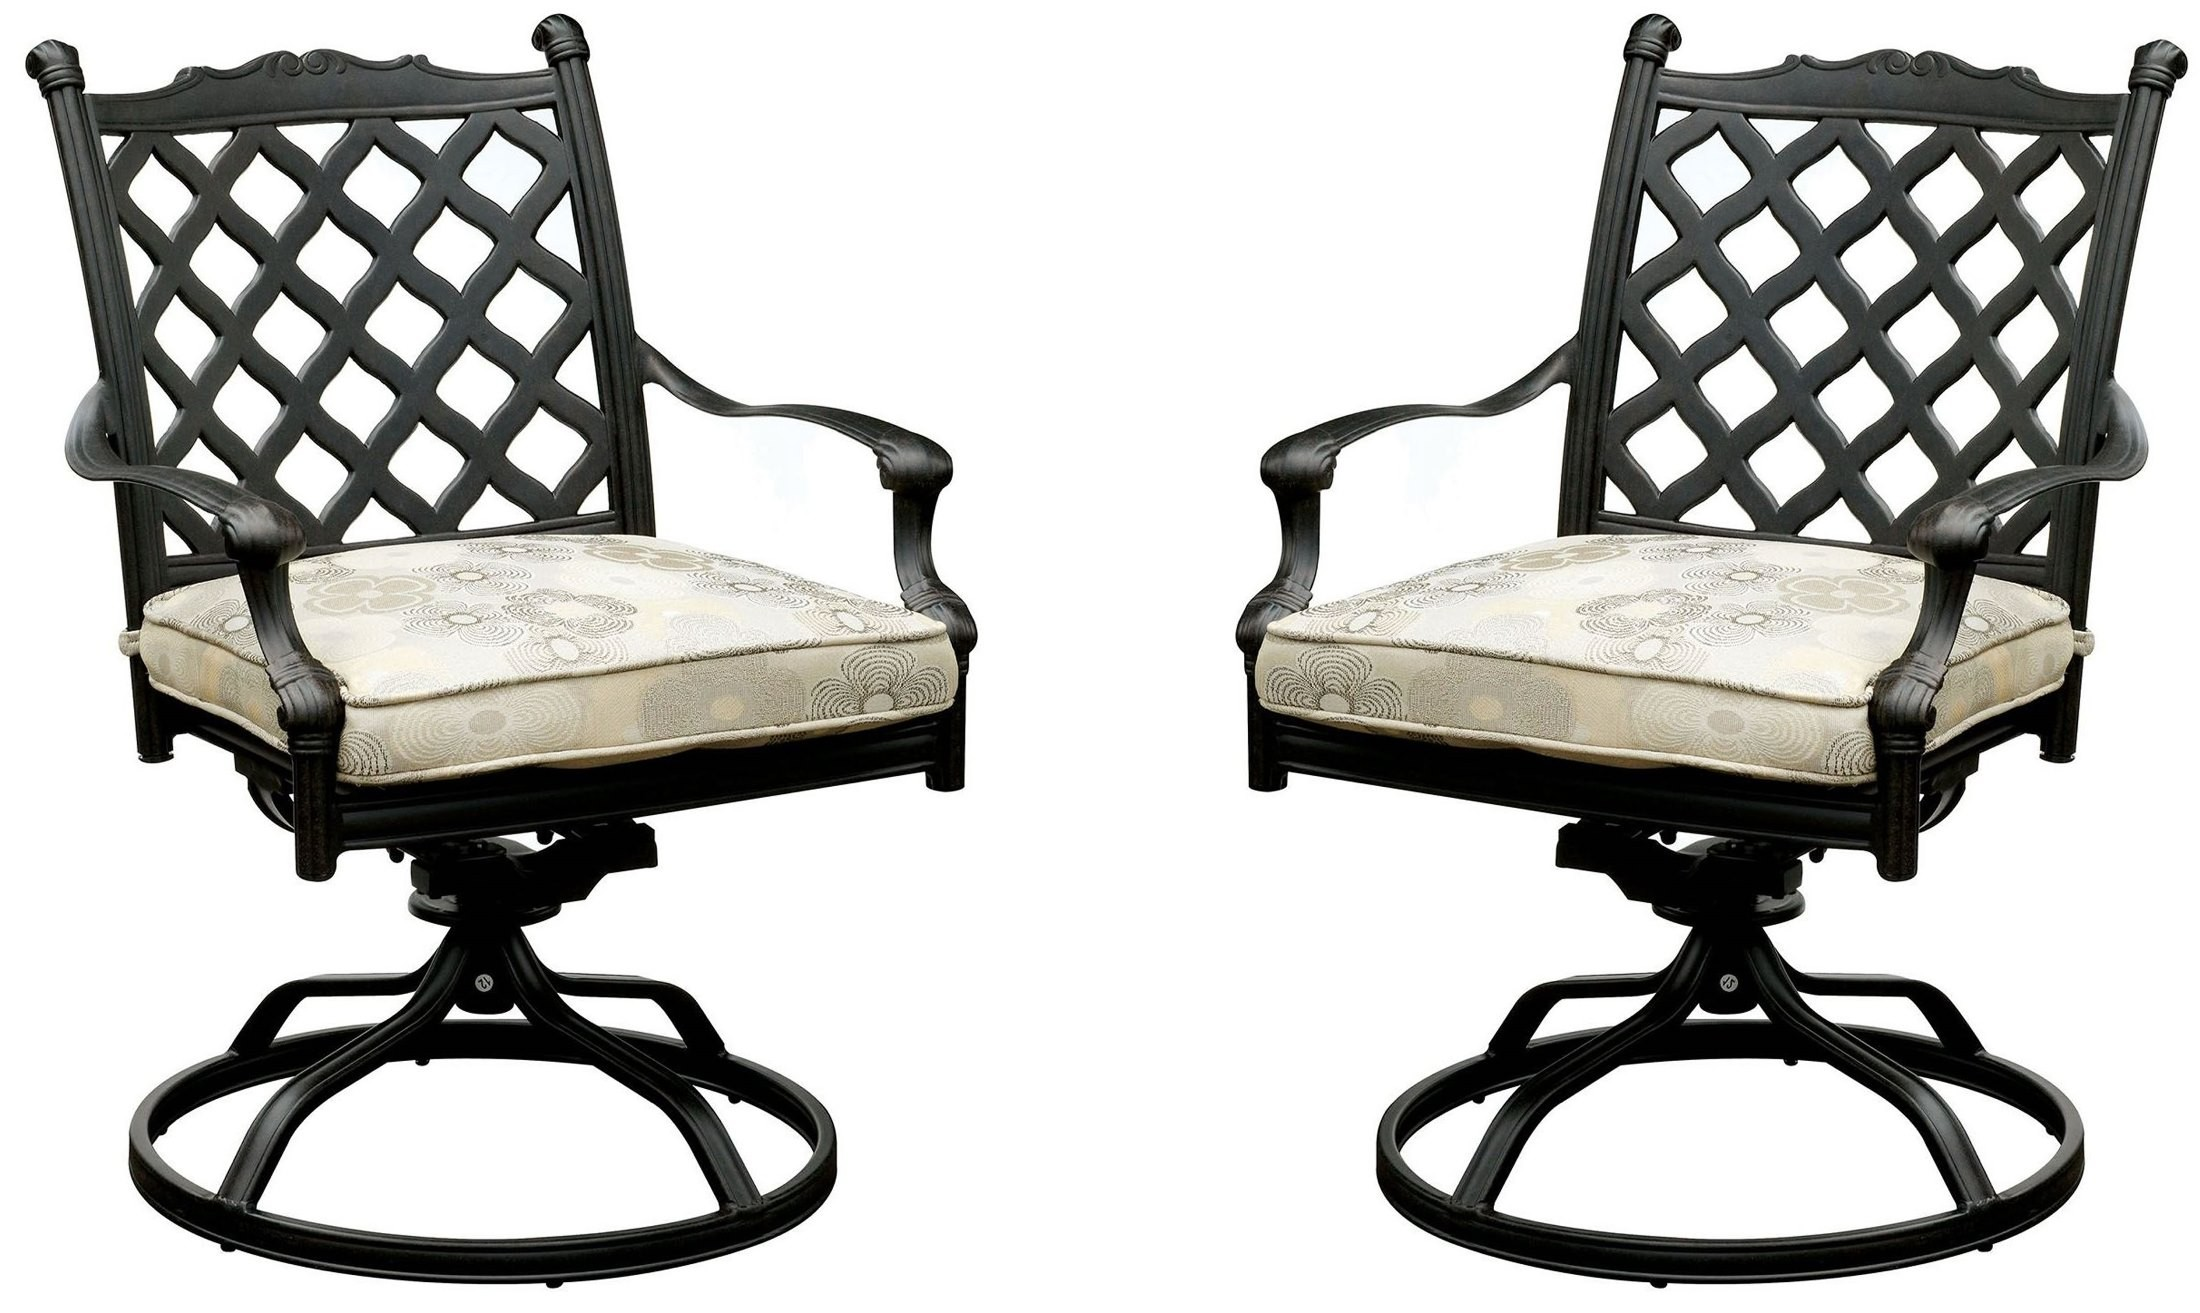 grey fabric swivel office chair stylist chairs wholesale chiara i tan and dark gray rocker set